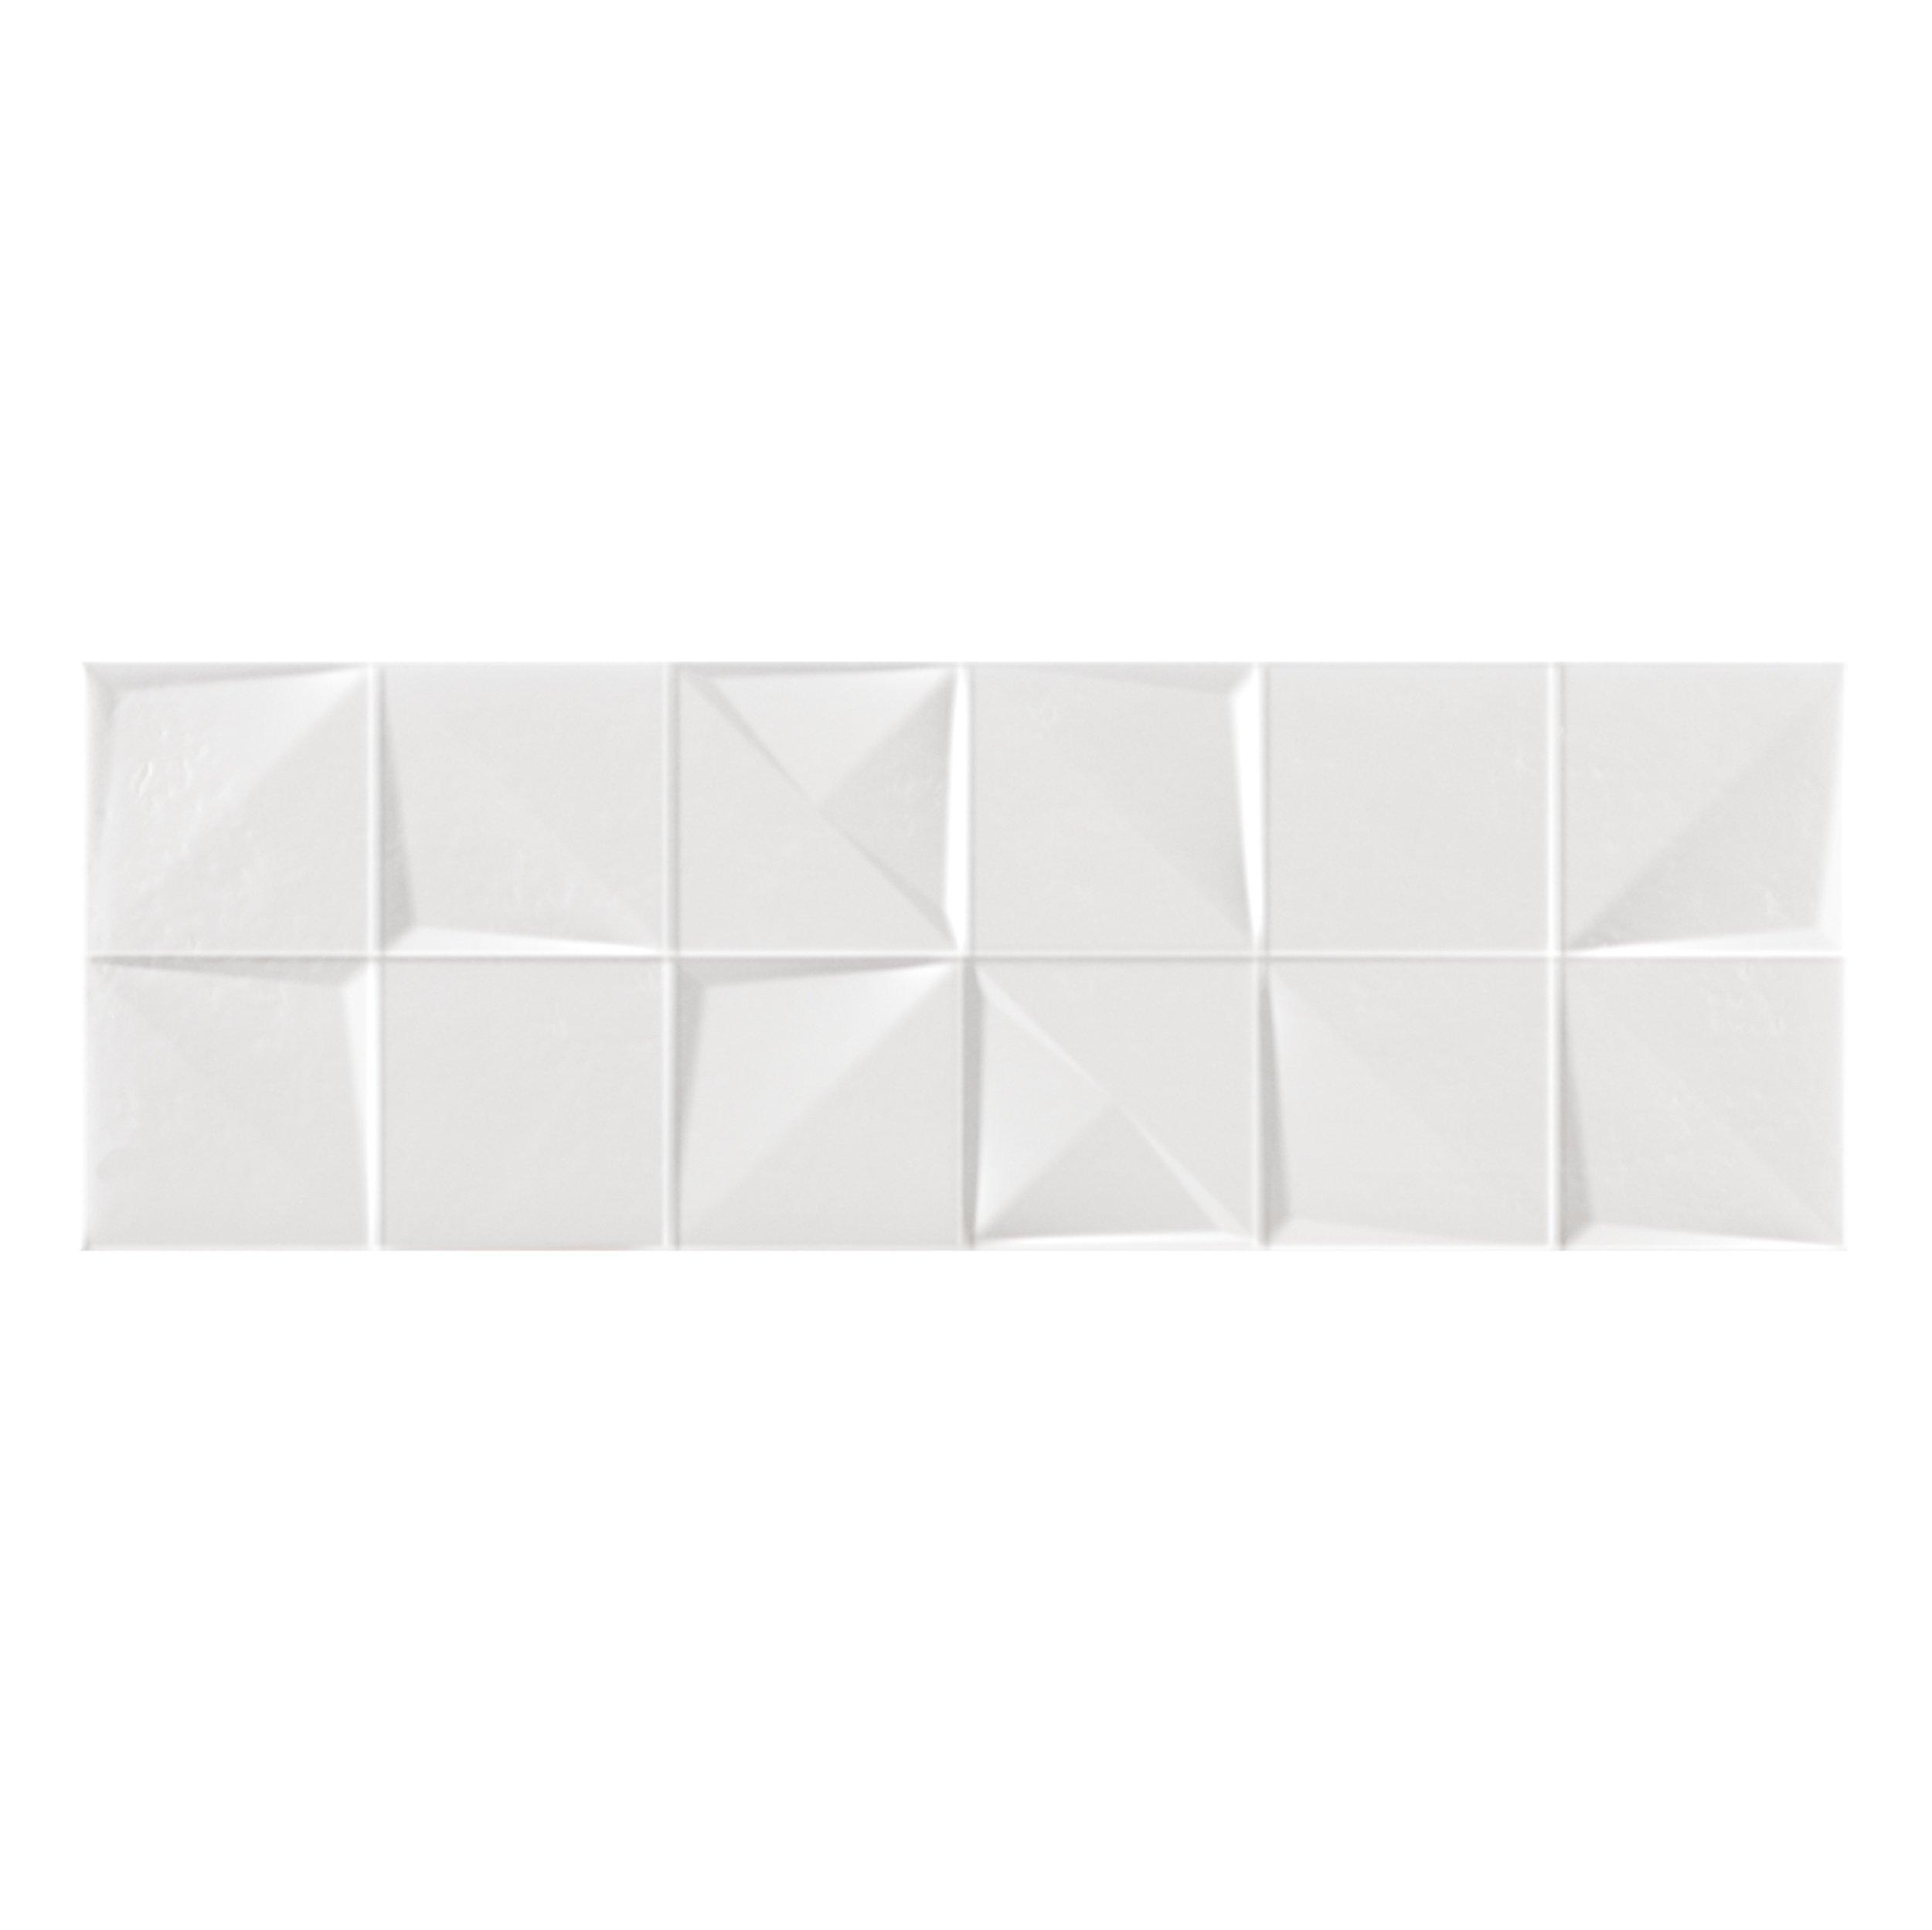 idol tear gray ceramic tile 12 x 24